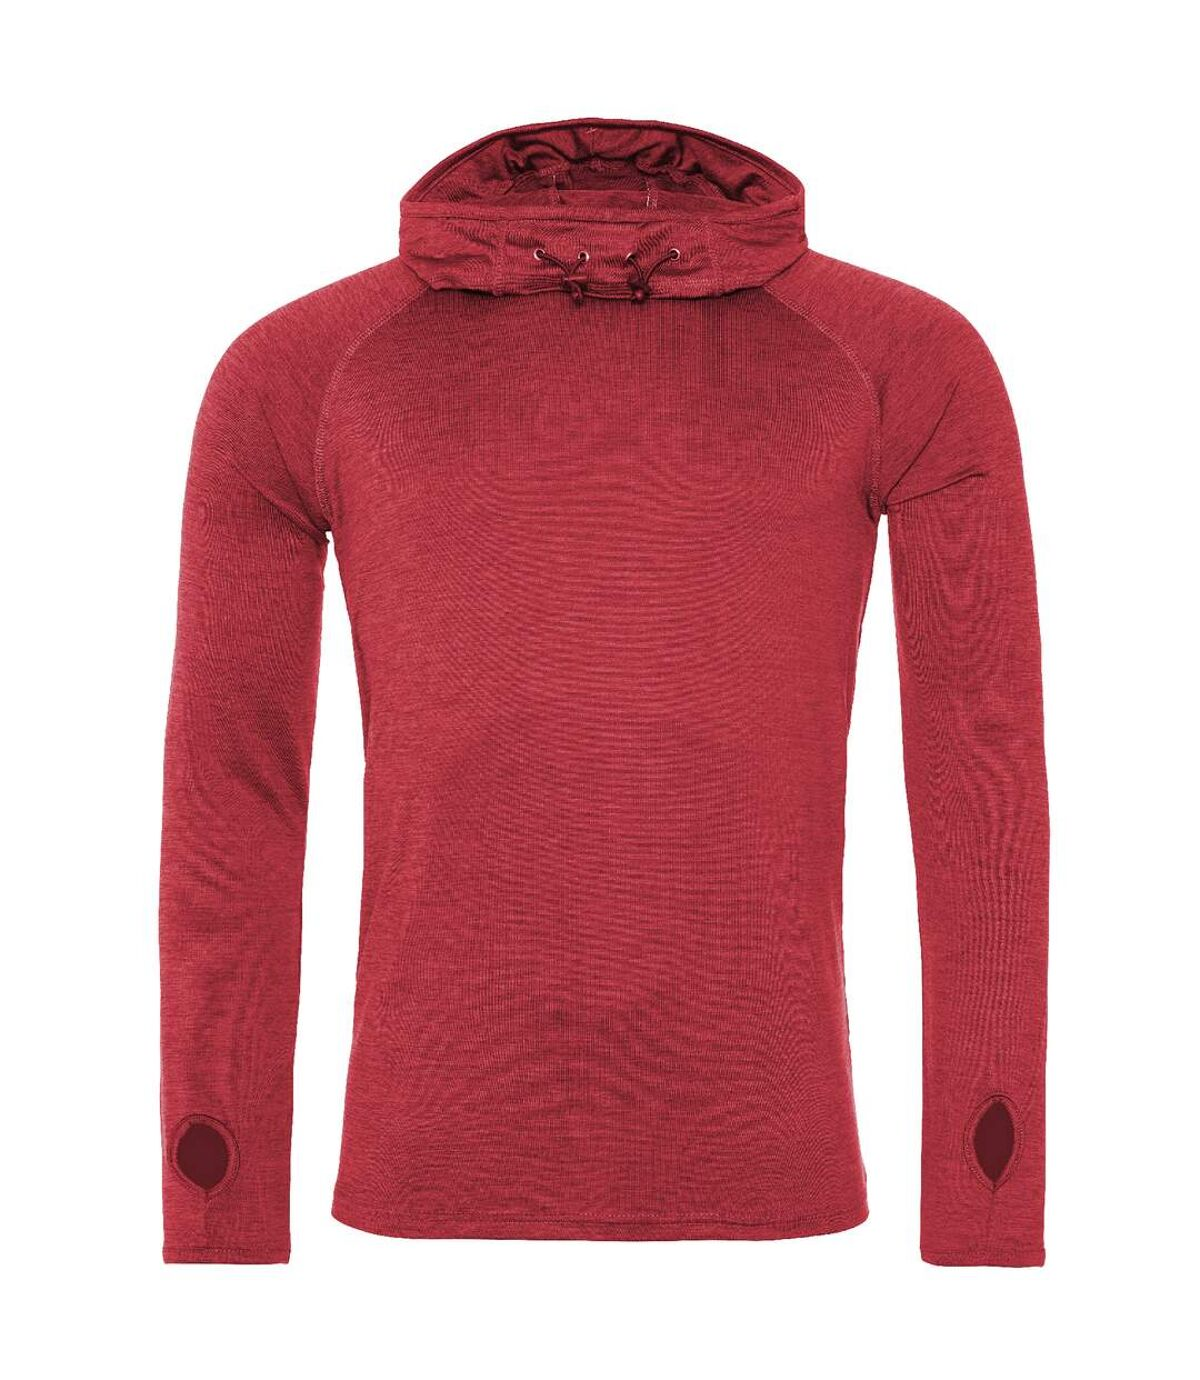 AWDis Just Cool Mens Cowl Neck Long Sleeve Baselayer Top (Red Melange) - UTRW5358